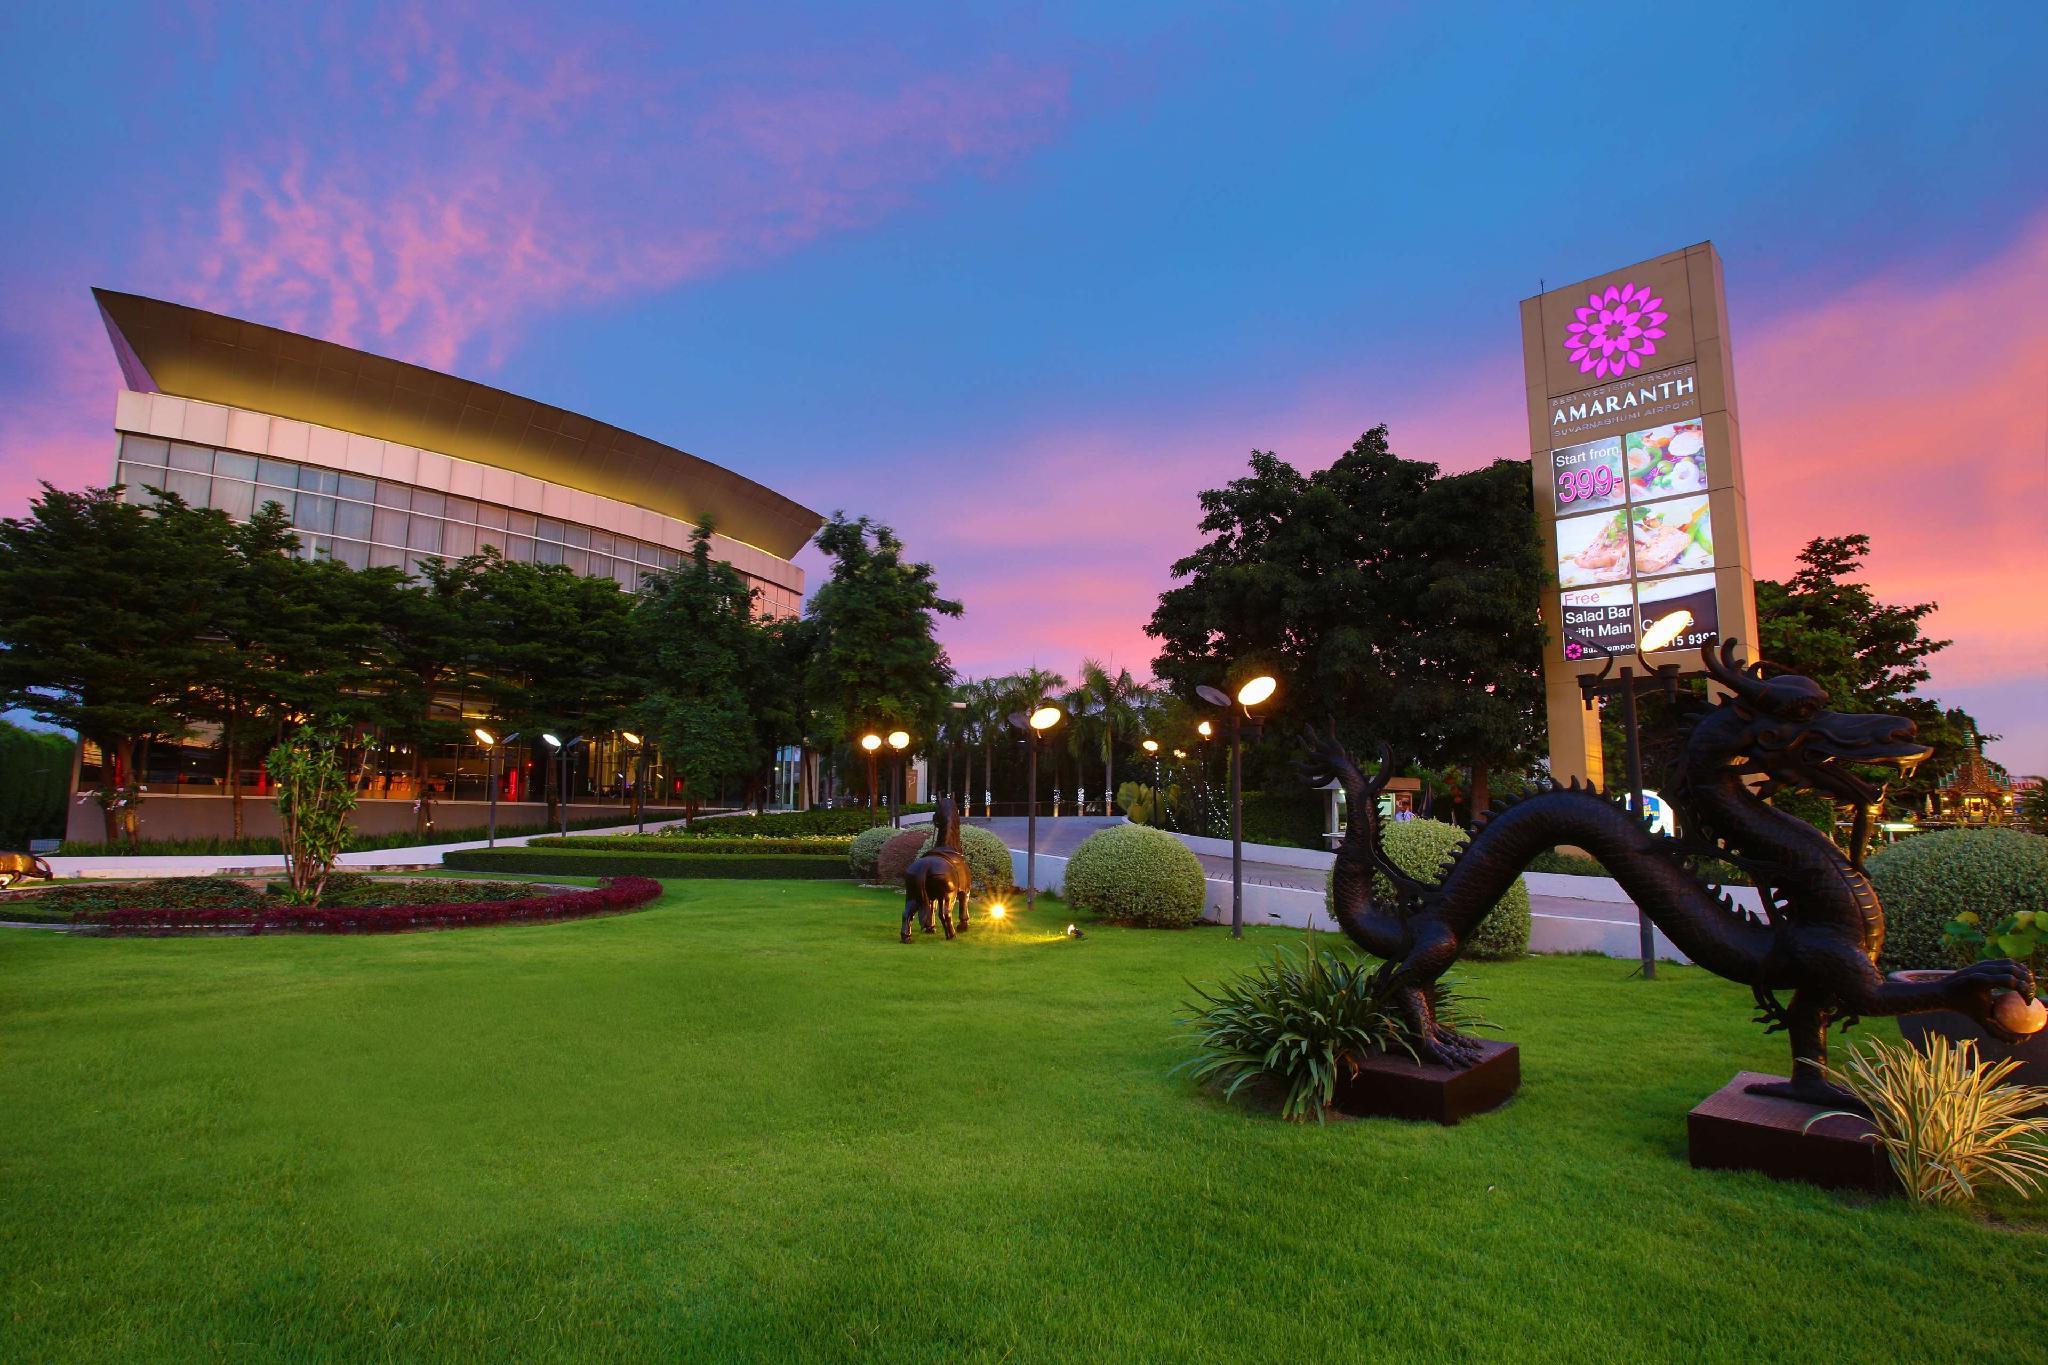 Best Western Premier Amaranth Suvarnabhumi Airport - Bangkok